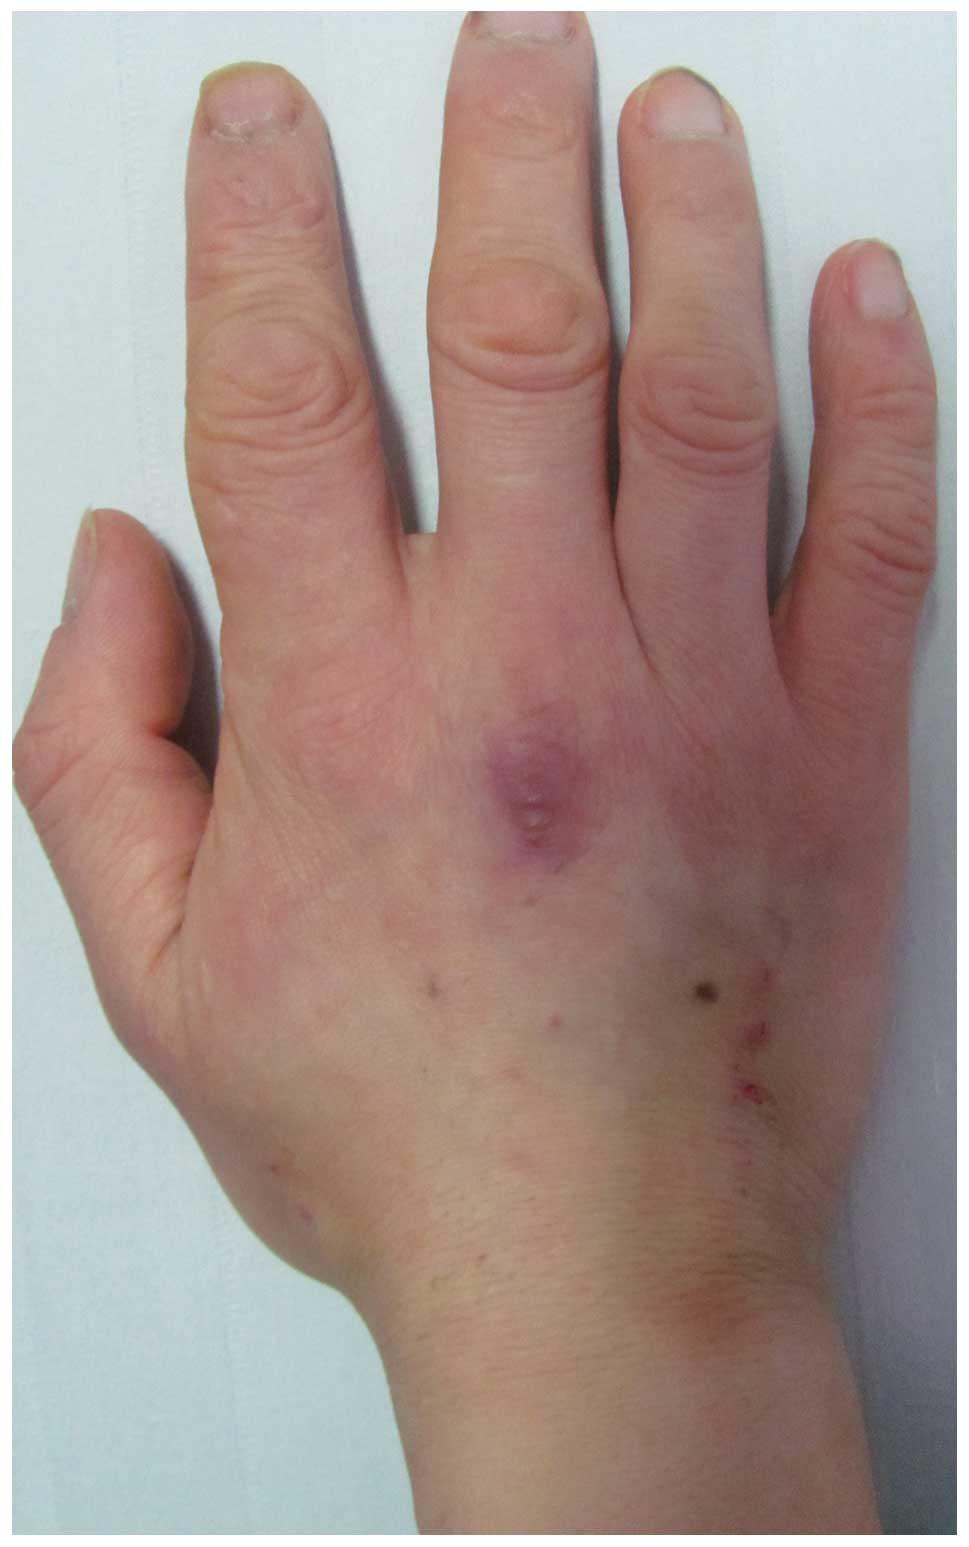 Upper GI/ Colonoscopy results - Crohns Disease